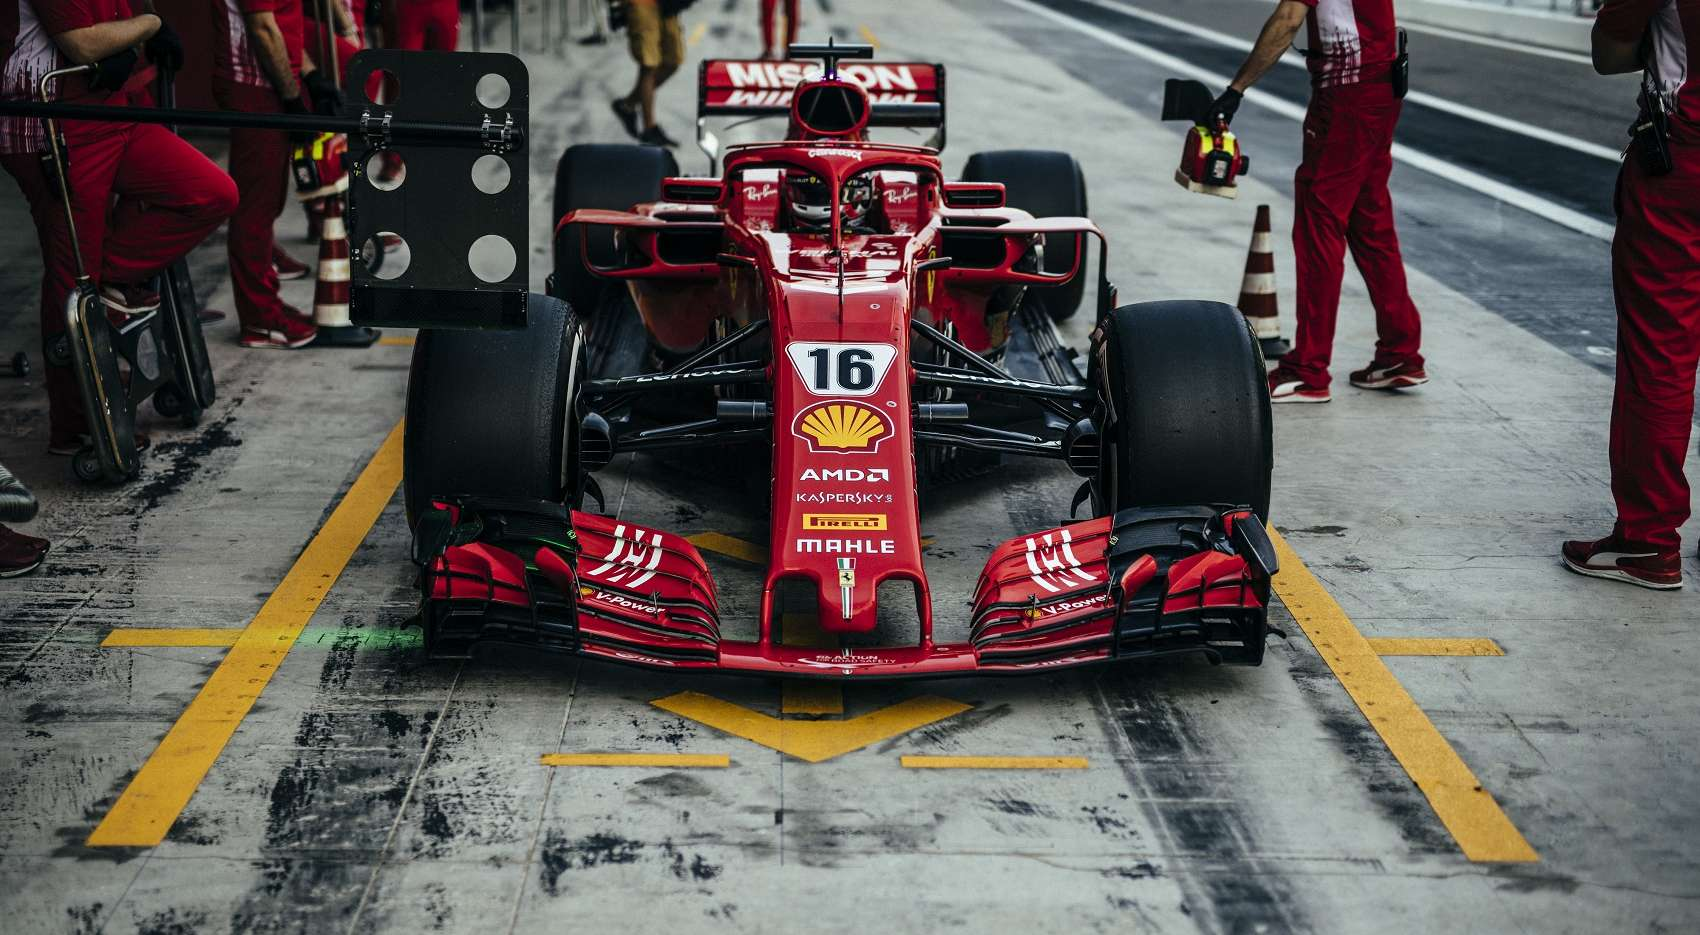 Charles Leclerc, Ferrari, Abu Dhabi teszt, racingline, racinglinehu, racingline.hu